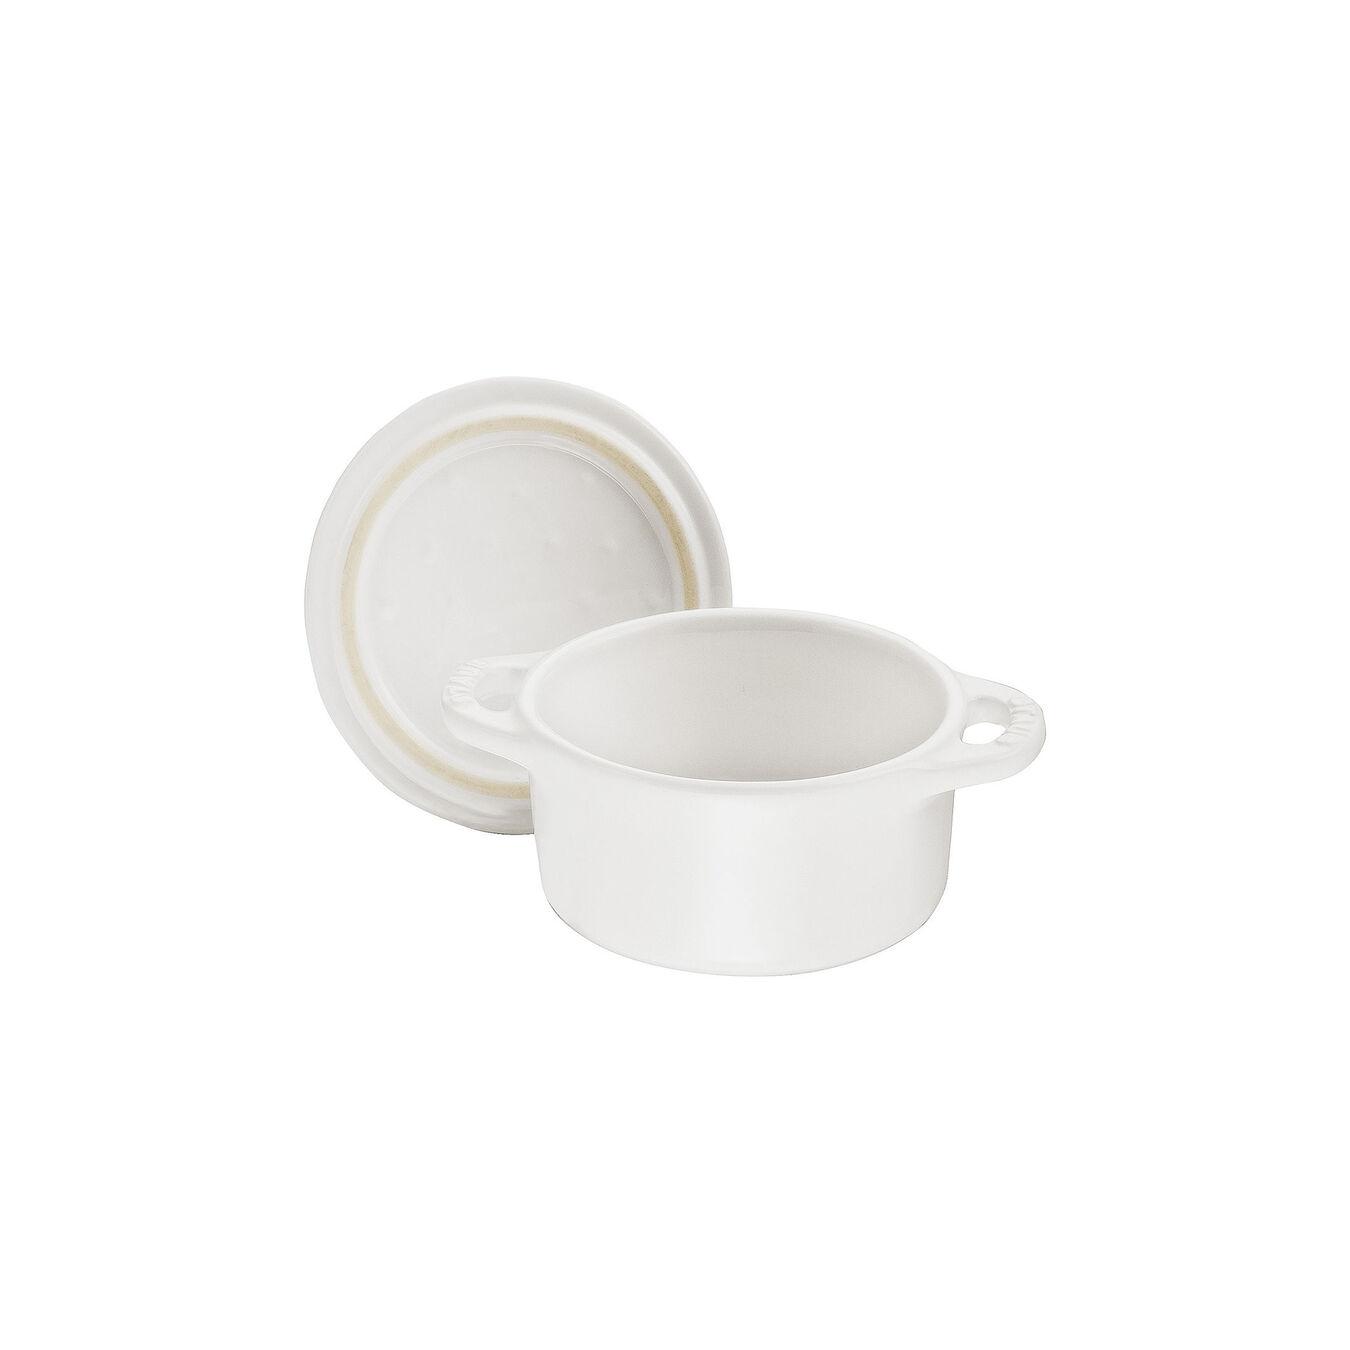 Mini Cocotte 10 cm, redondo, Branco puro, Cerâmica,,large 5